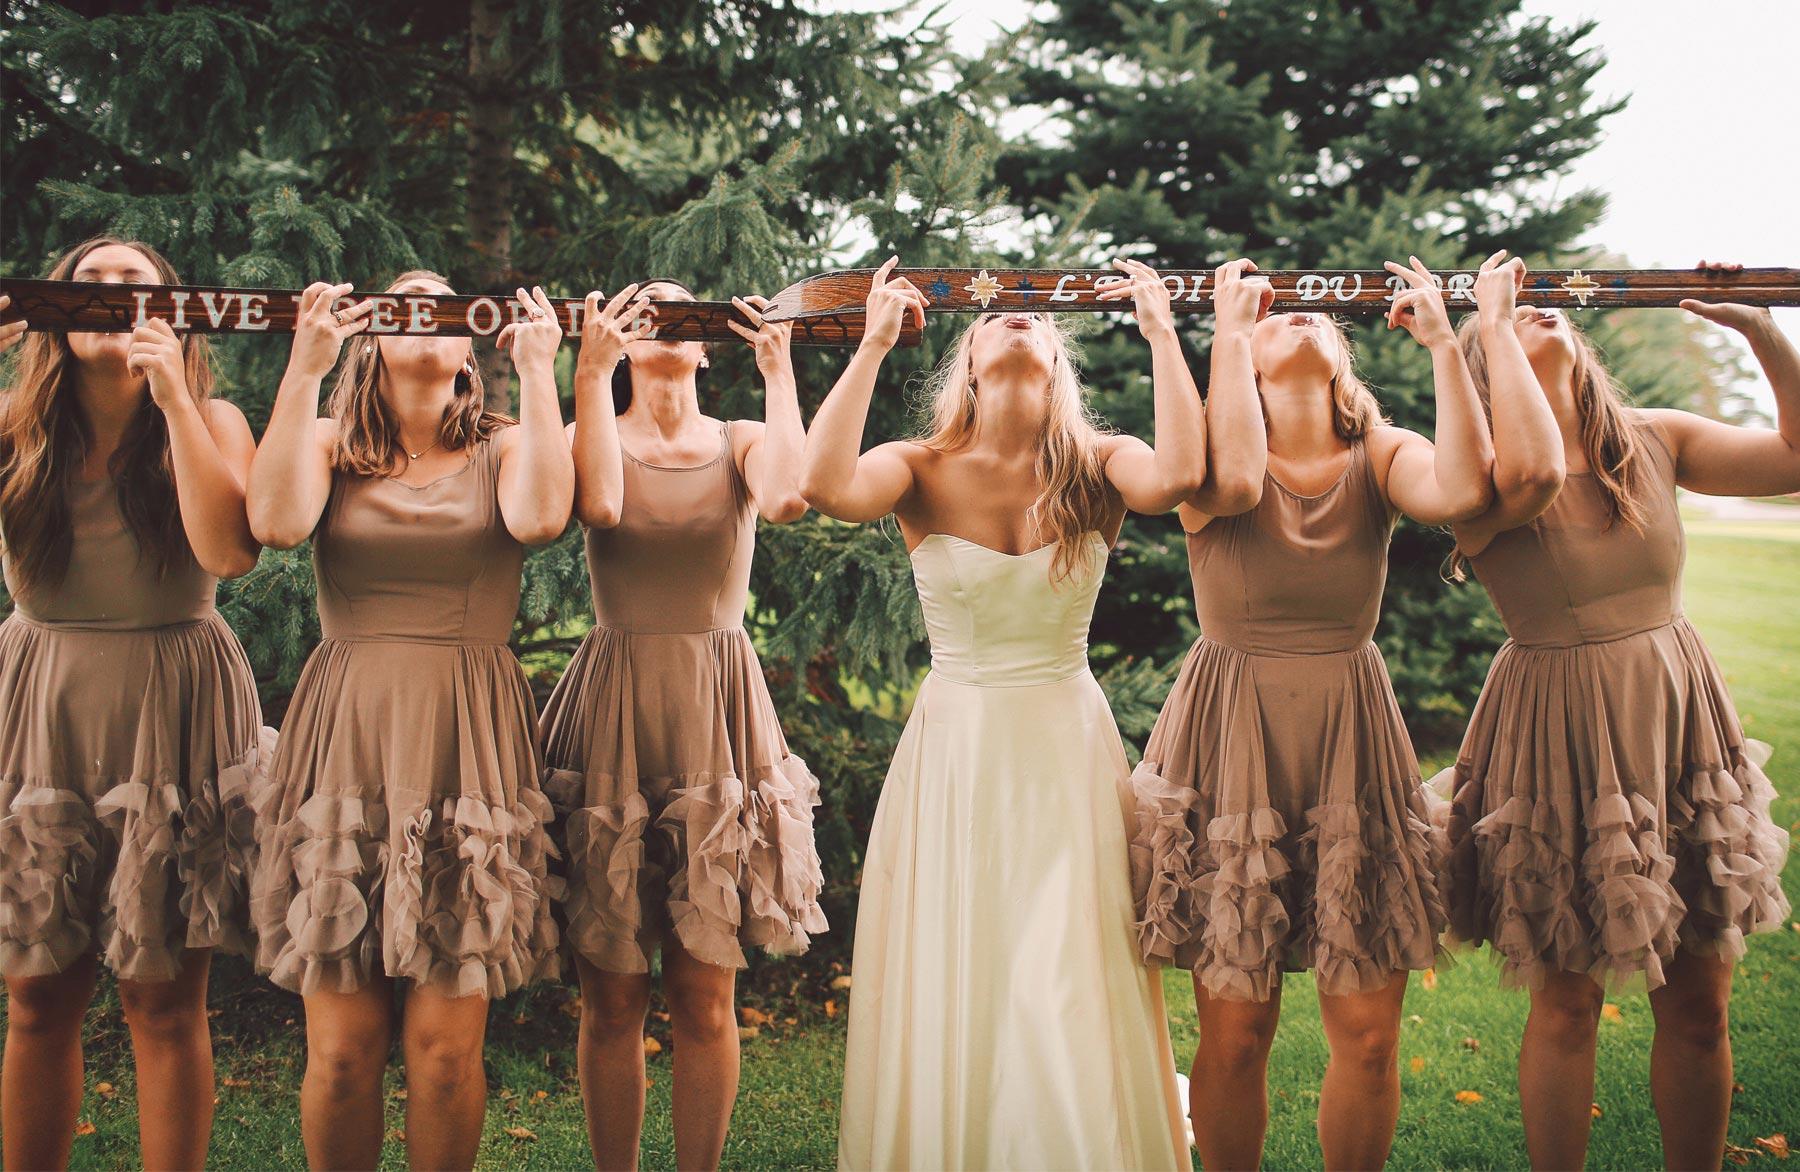 17-Minneapolis-Minnesota-Wedding-Photographer-by-Andrew-Vick-Photography-Fall-Autumn-Minikahda-Club-Bride-Bridesmaids-Champagne-Shot-Ski-Golf-Course-Vintage-Krissy-and-James.jpg